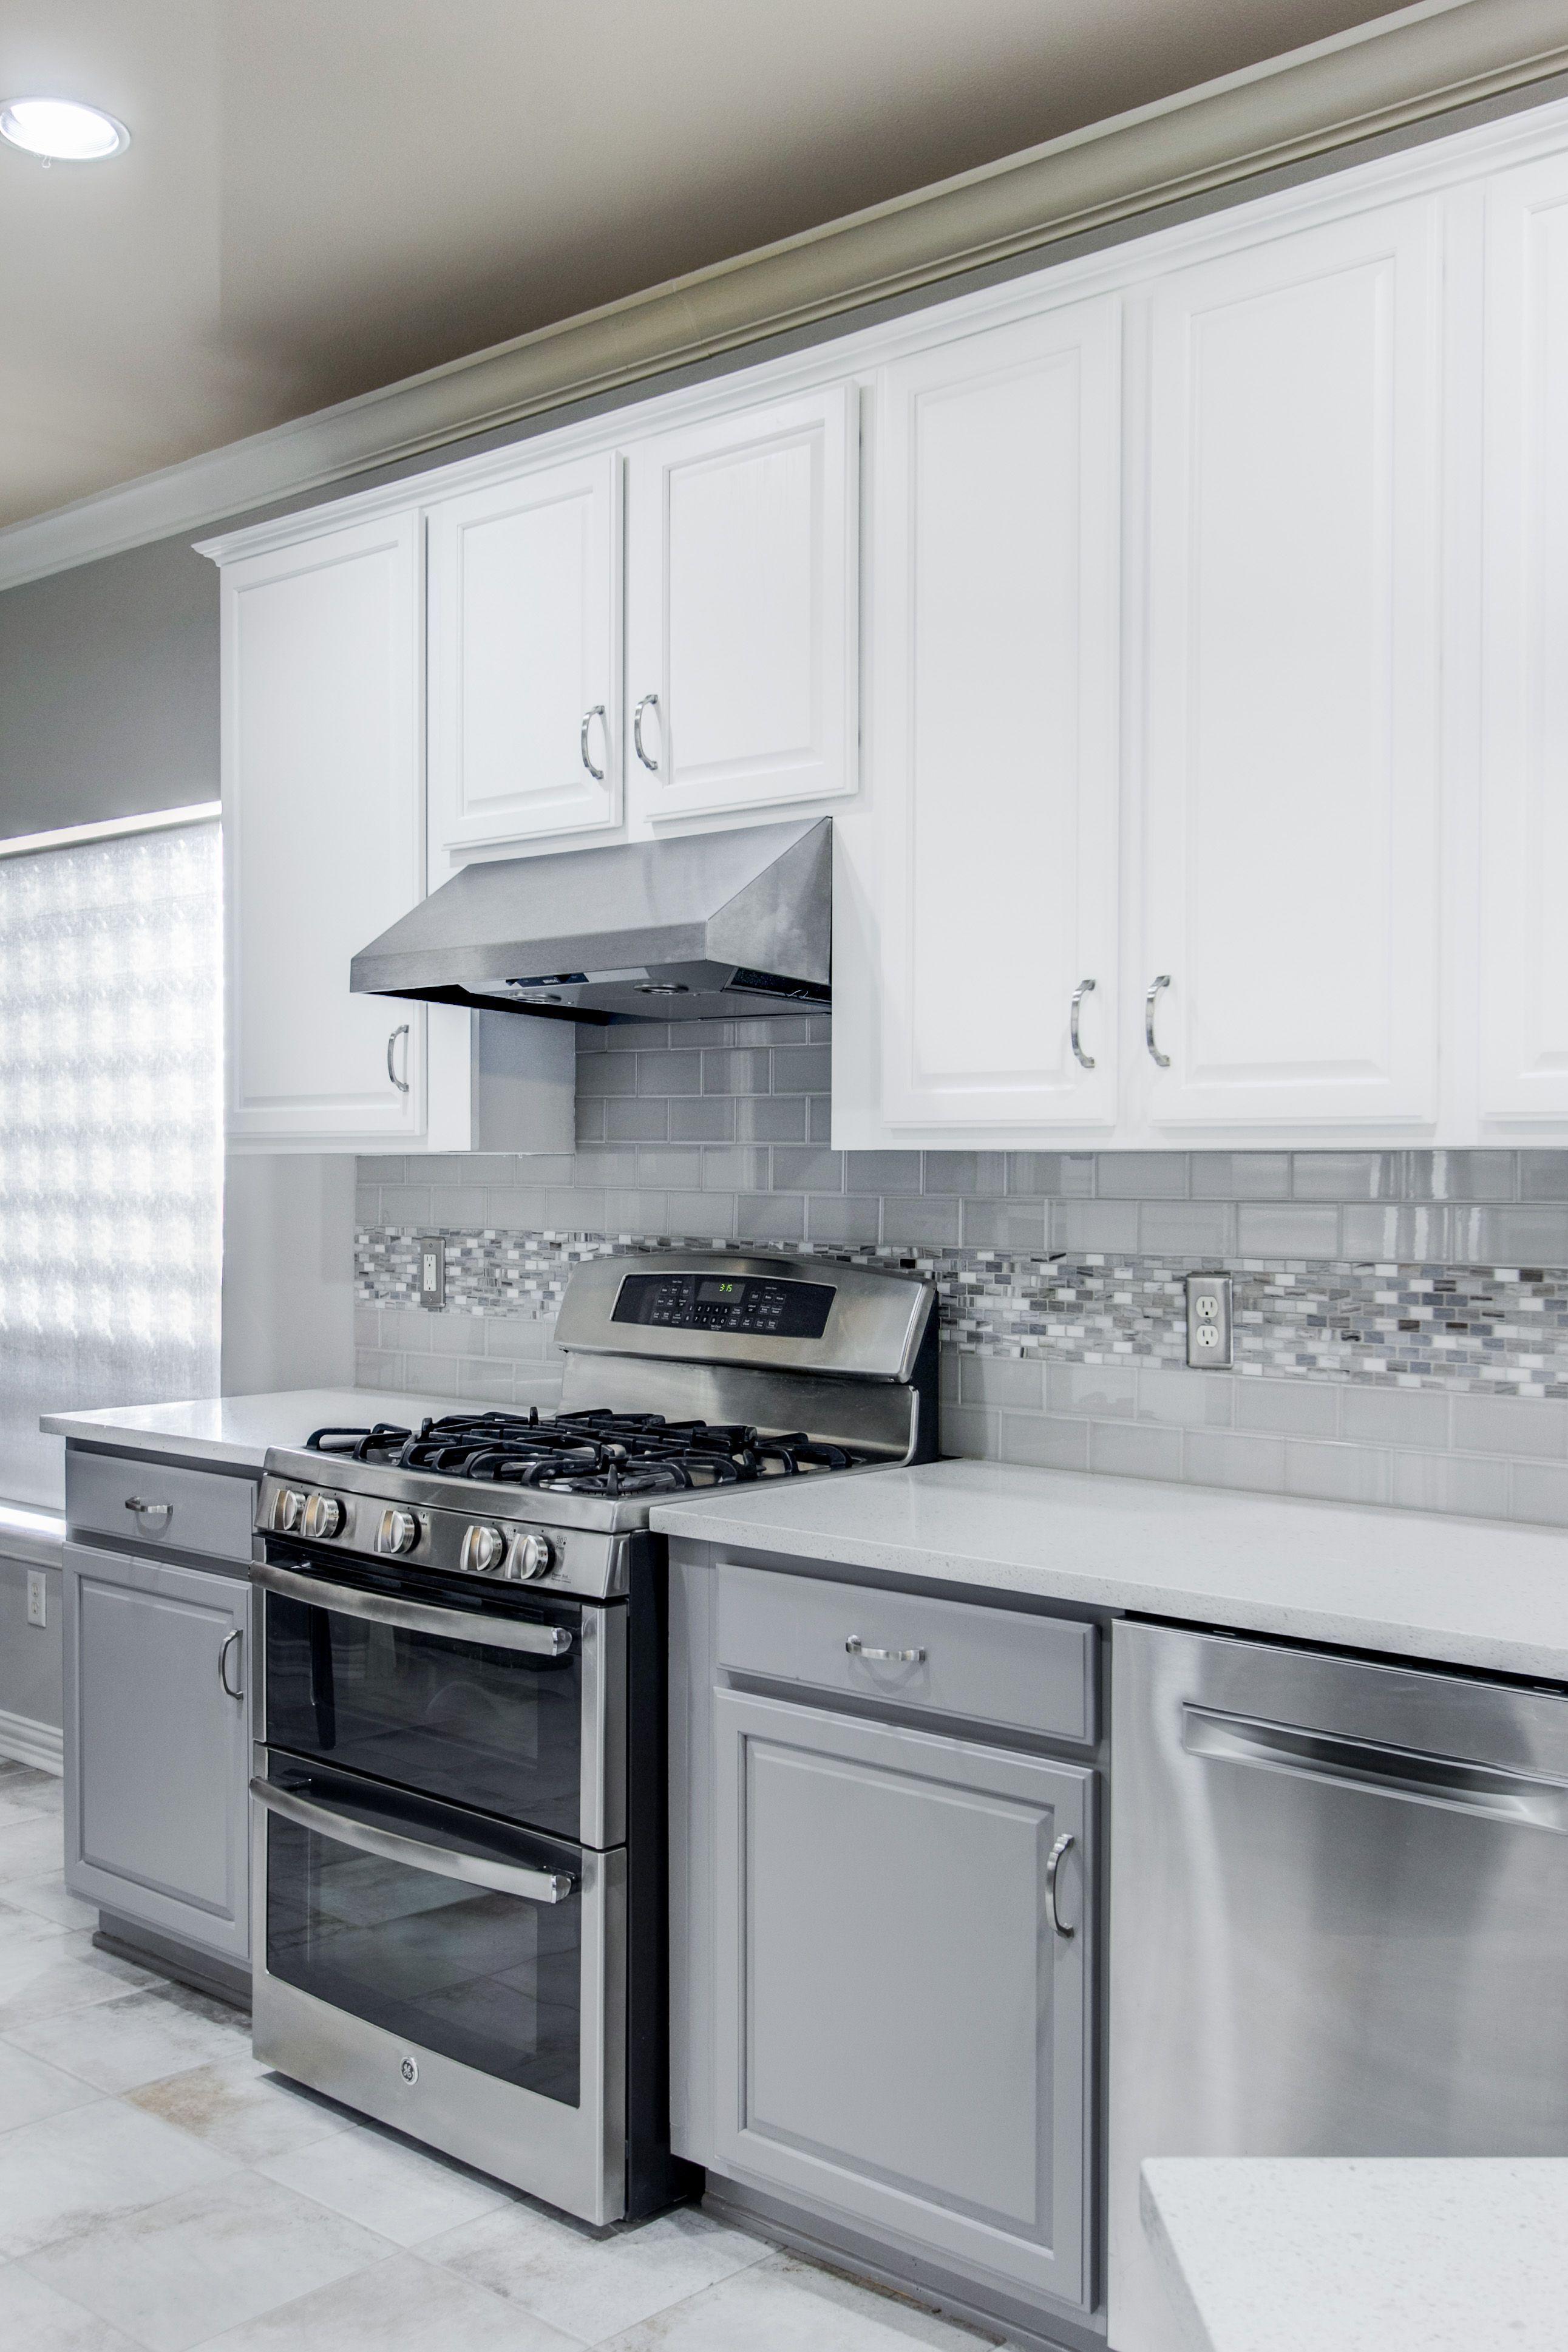 22 Jaw Dropping Small Kitchen Designs: Jaw-Dropping Tips: Travertine Backsplash Bathroom